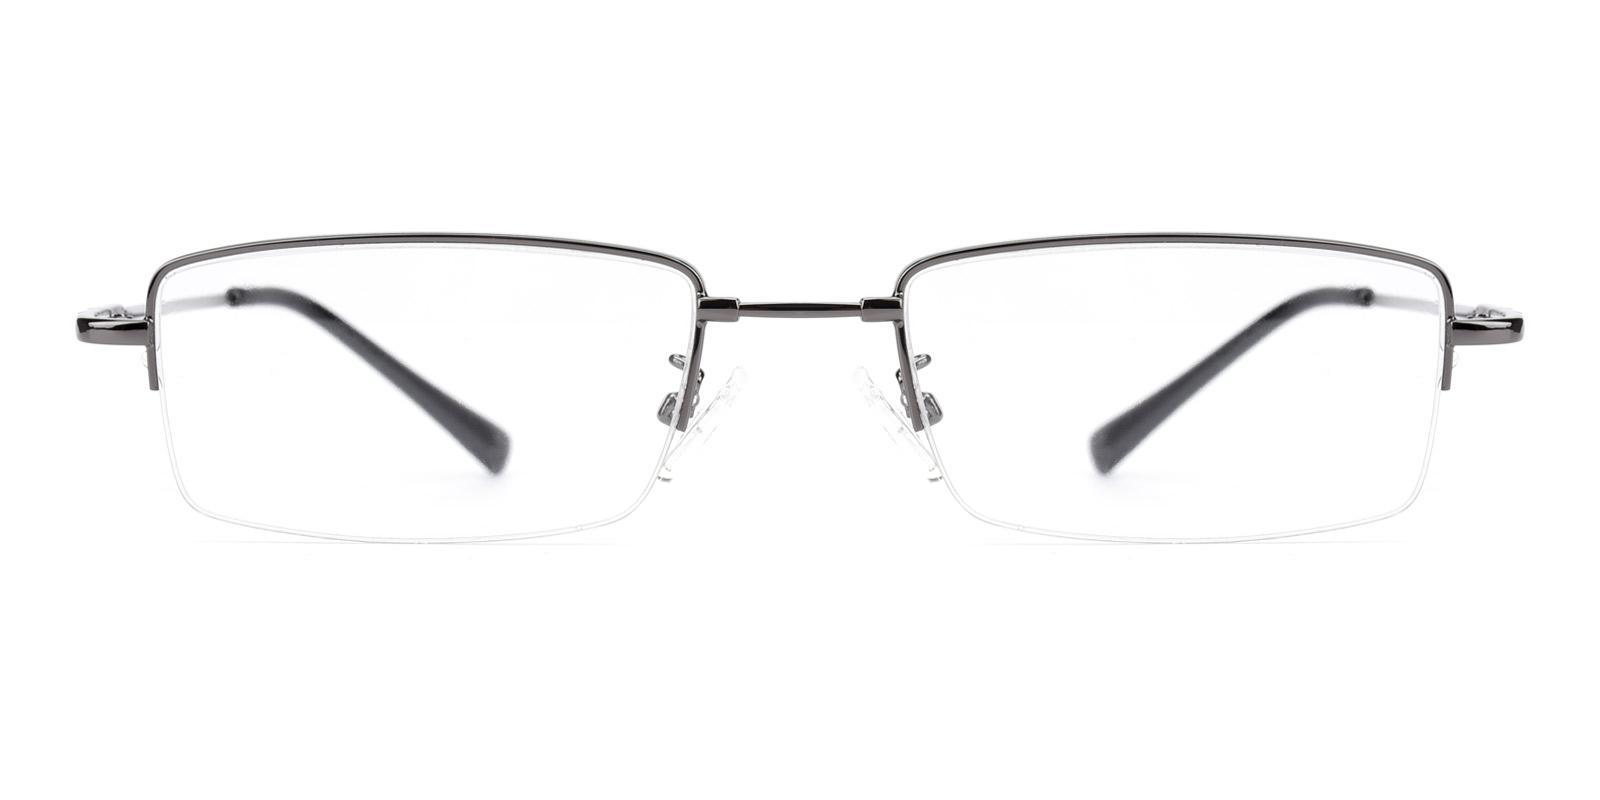 Pluto-Gun-Rectangle-Metal-Eyeglasses-additional2